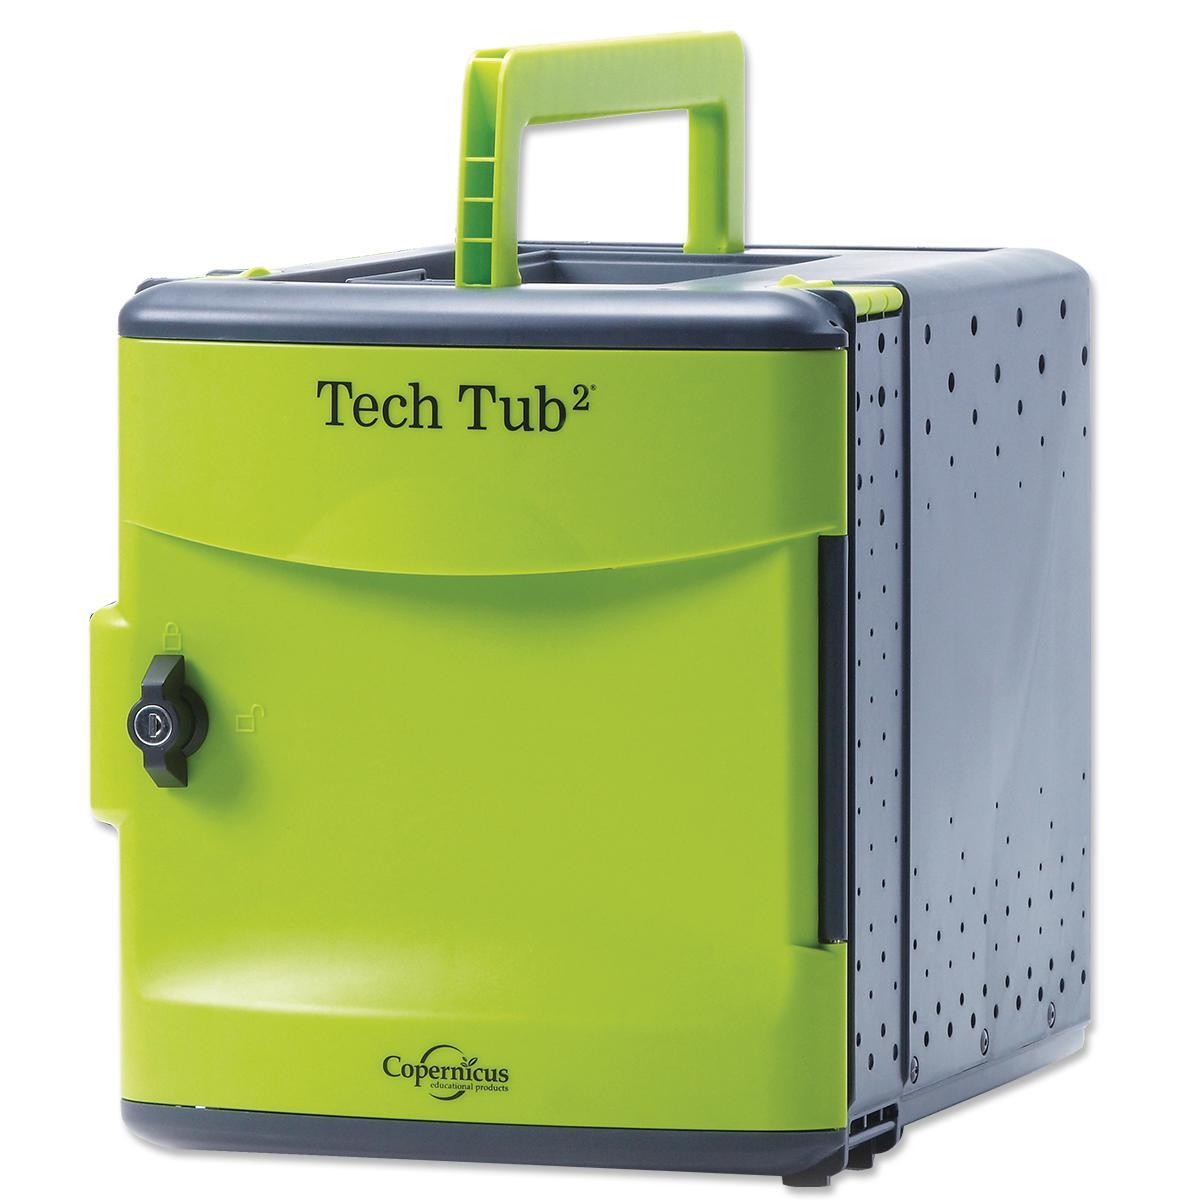 Tech Tub2®